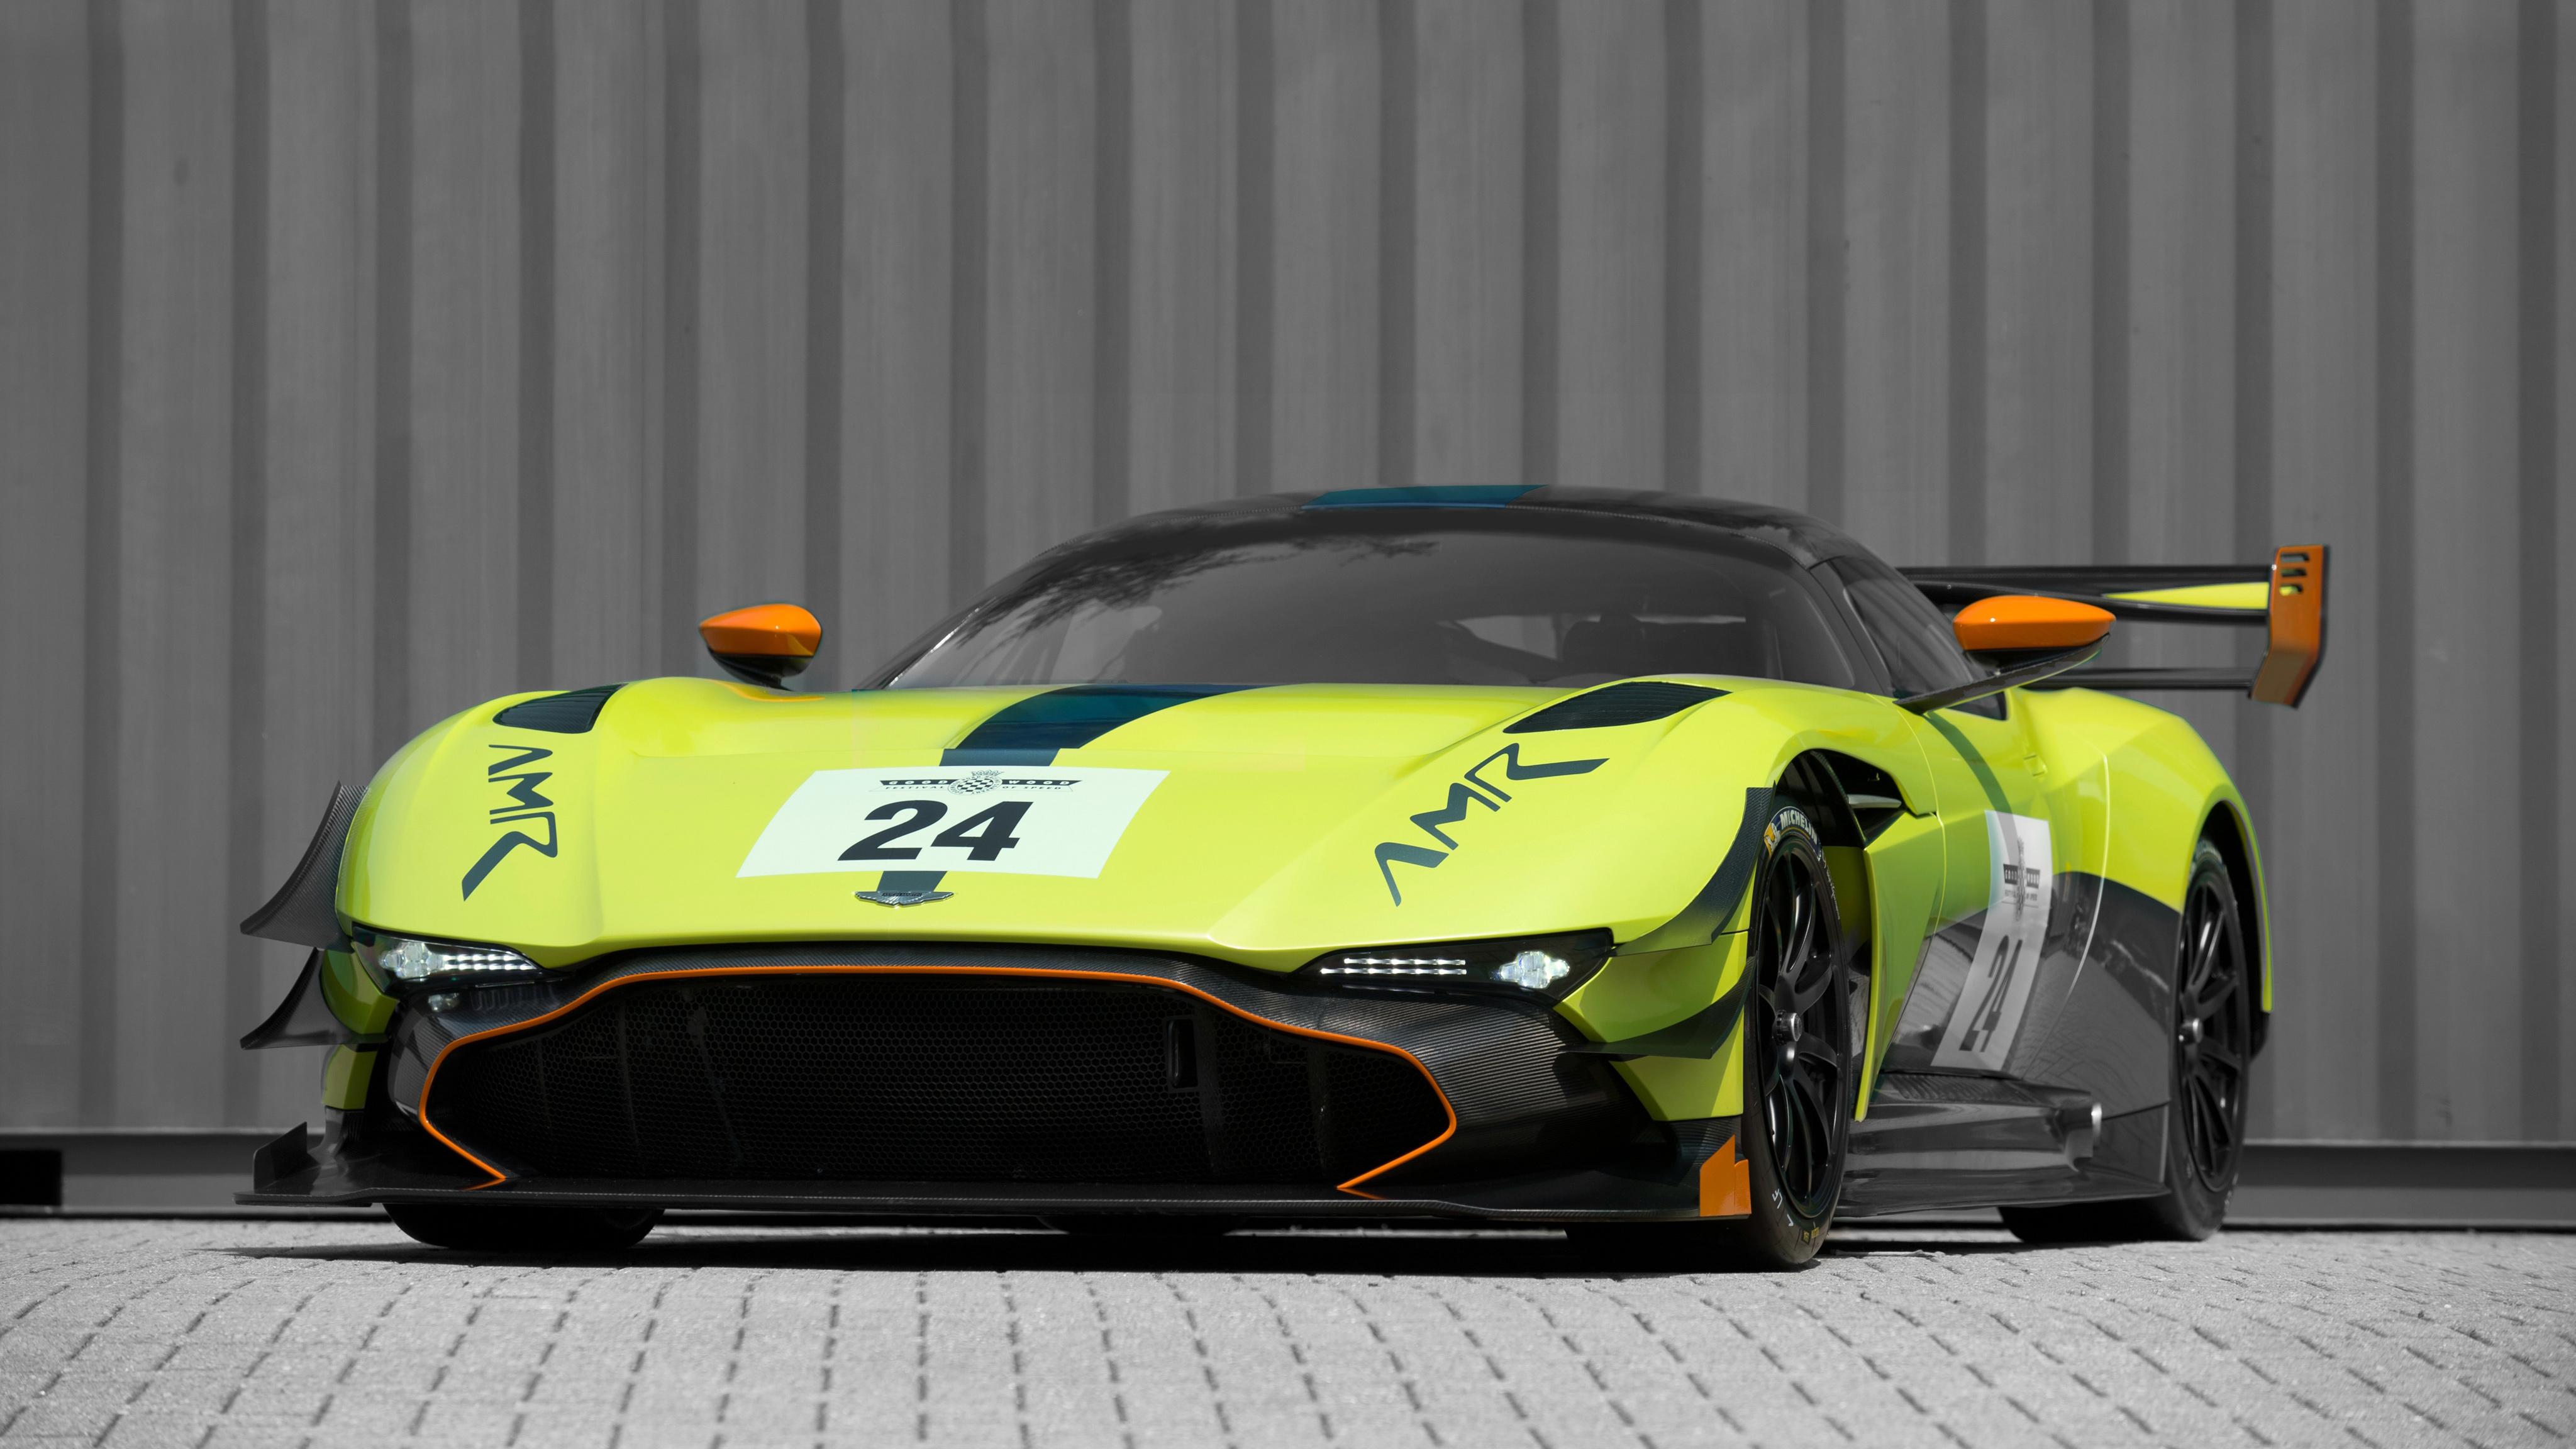 Aston martin vulcan amr pro 2018 4k wallpaper hd car wallpapers id 7932 - Vulcan wallpaper ...